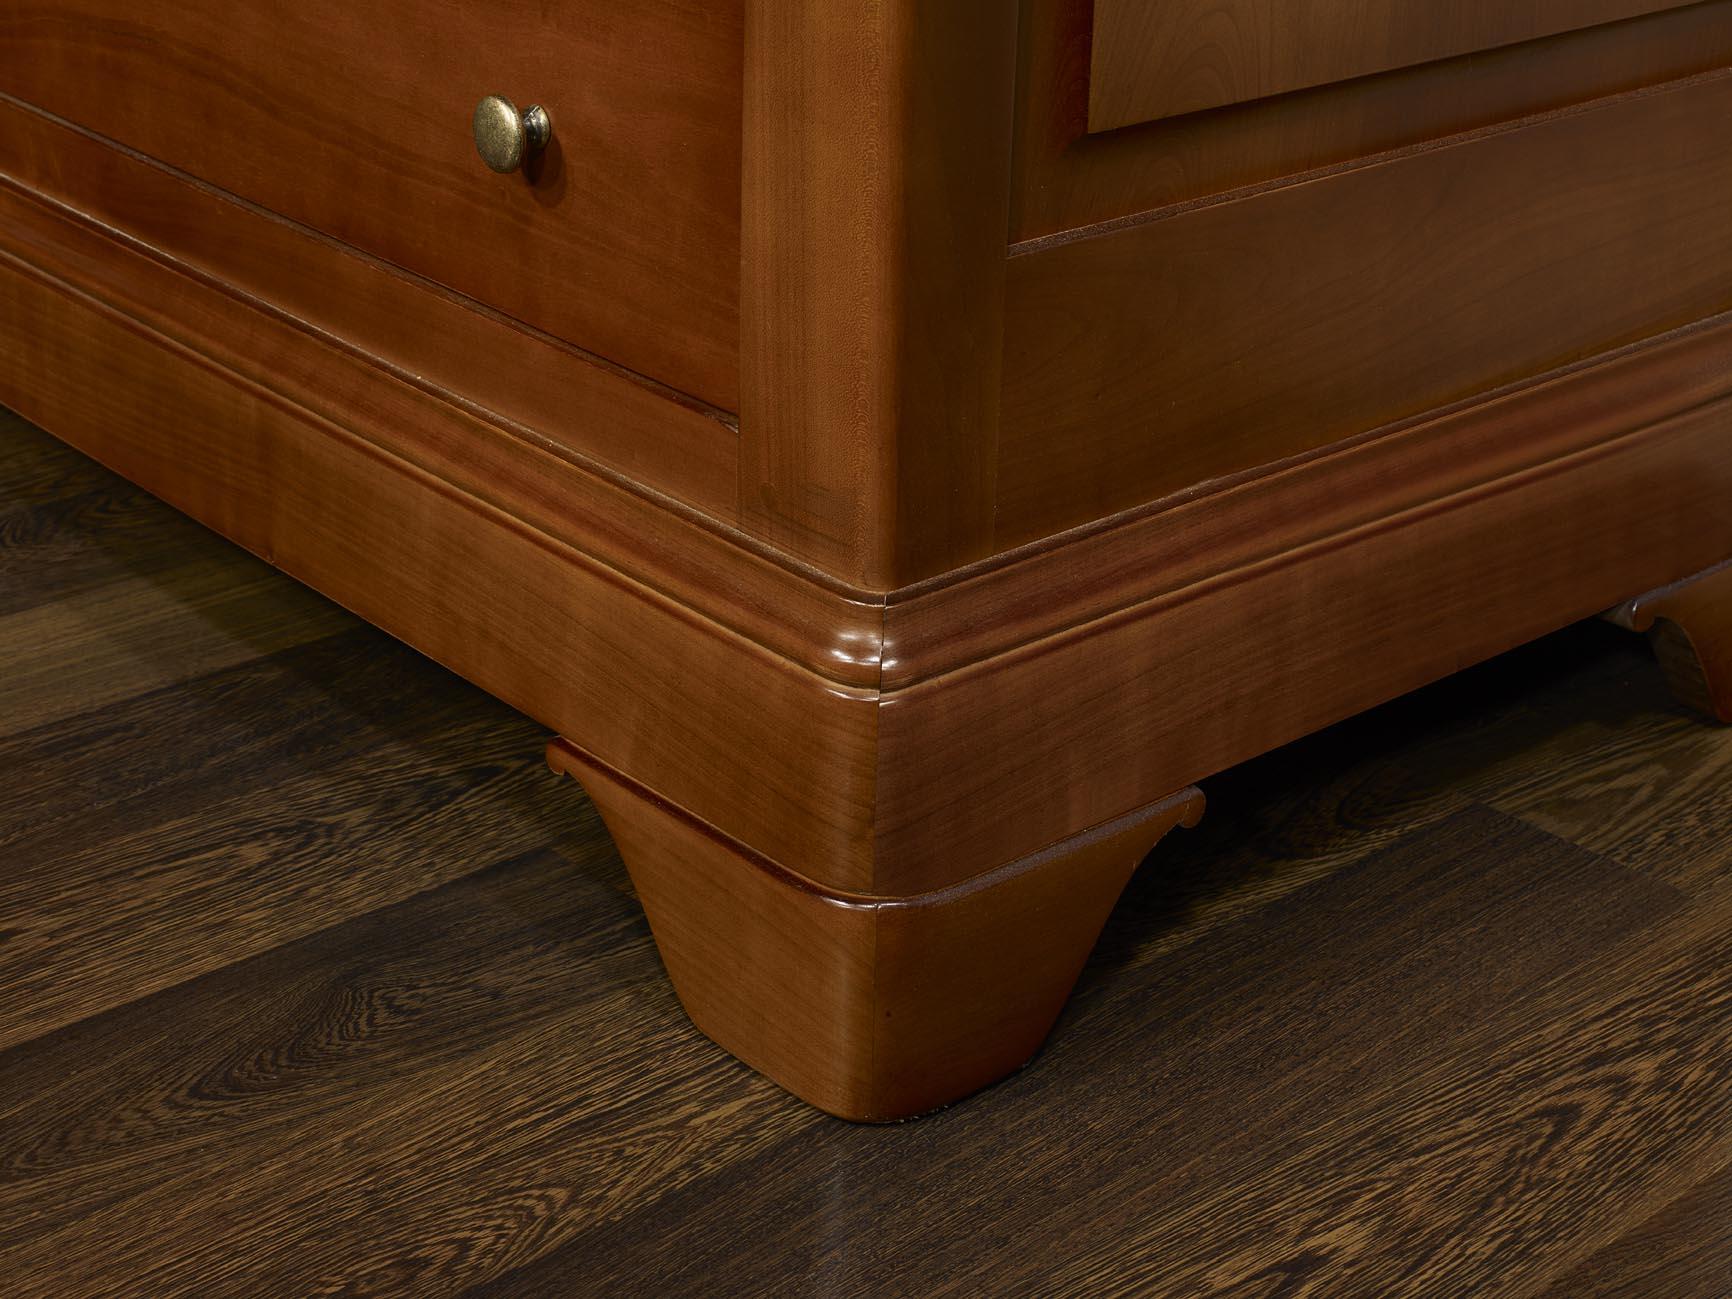 commode 7 tiroirs en merisier massif de style louis. Black Bedroom Furniture Sets. Home Design Ideas